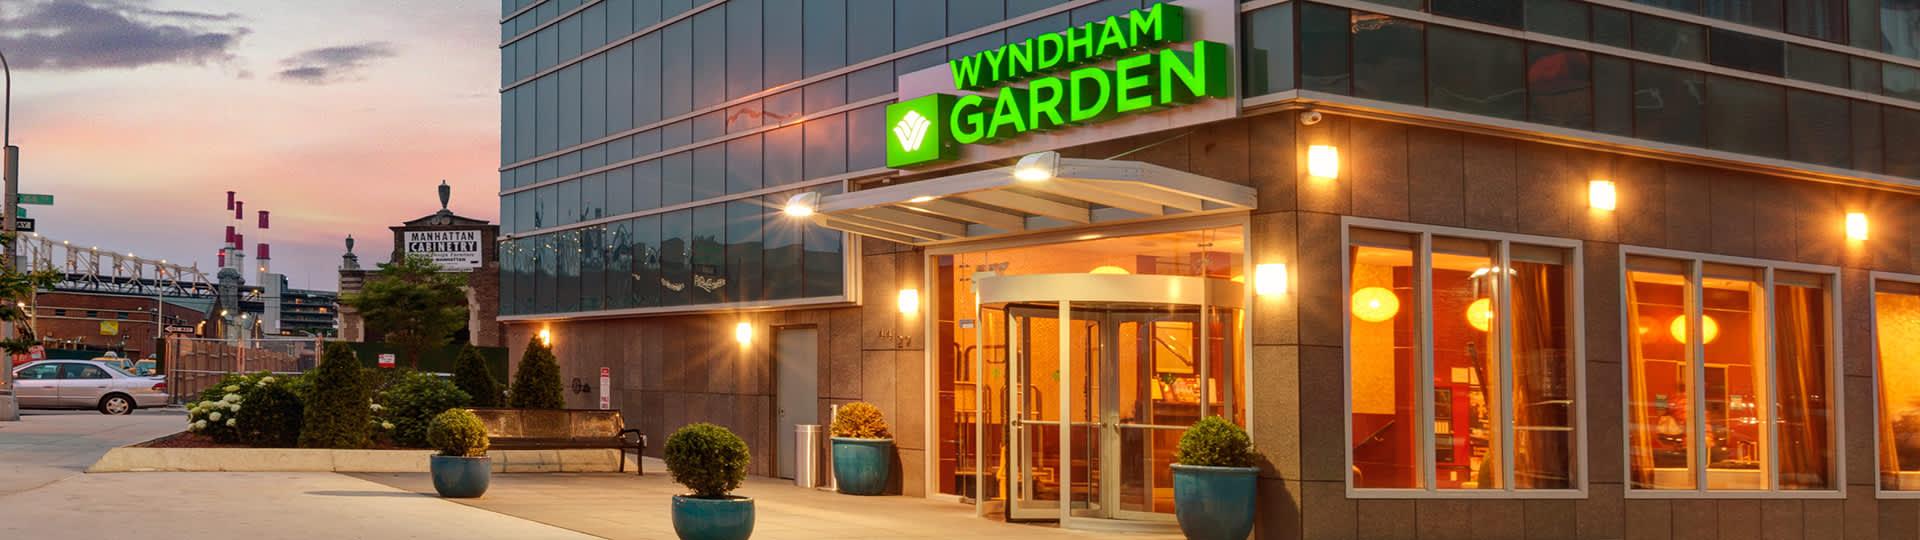 wyndham garden, lic